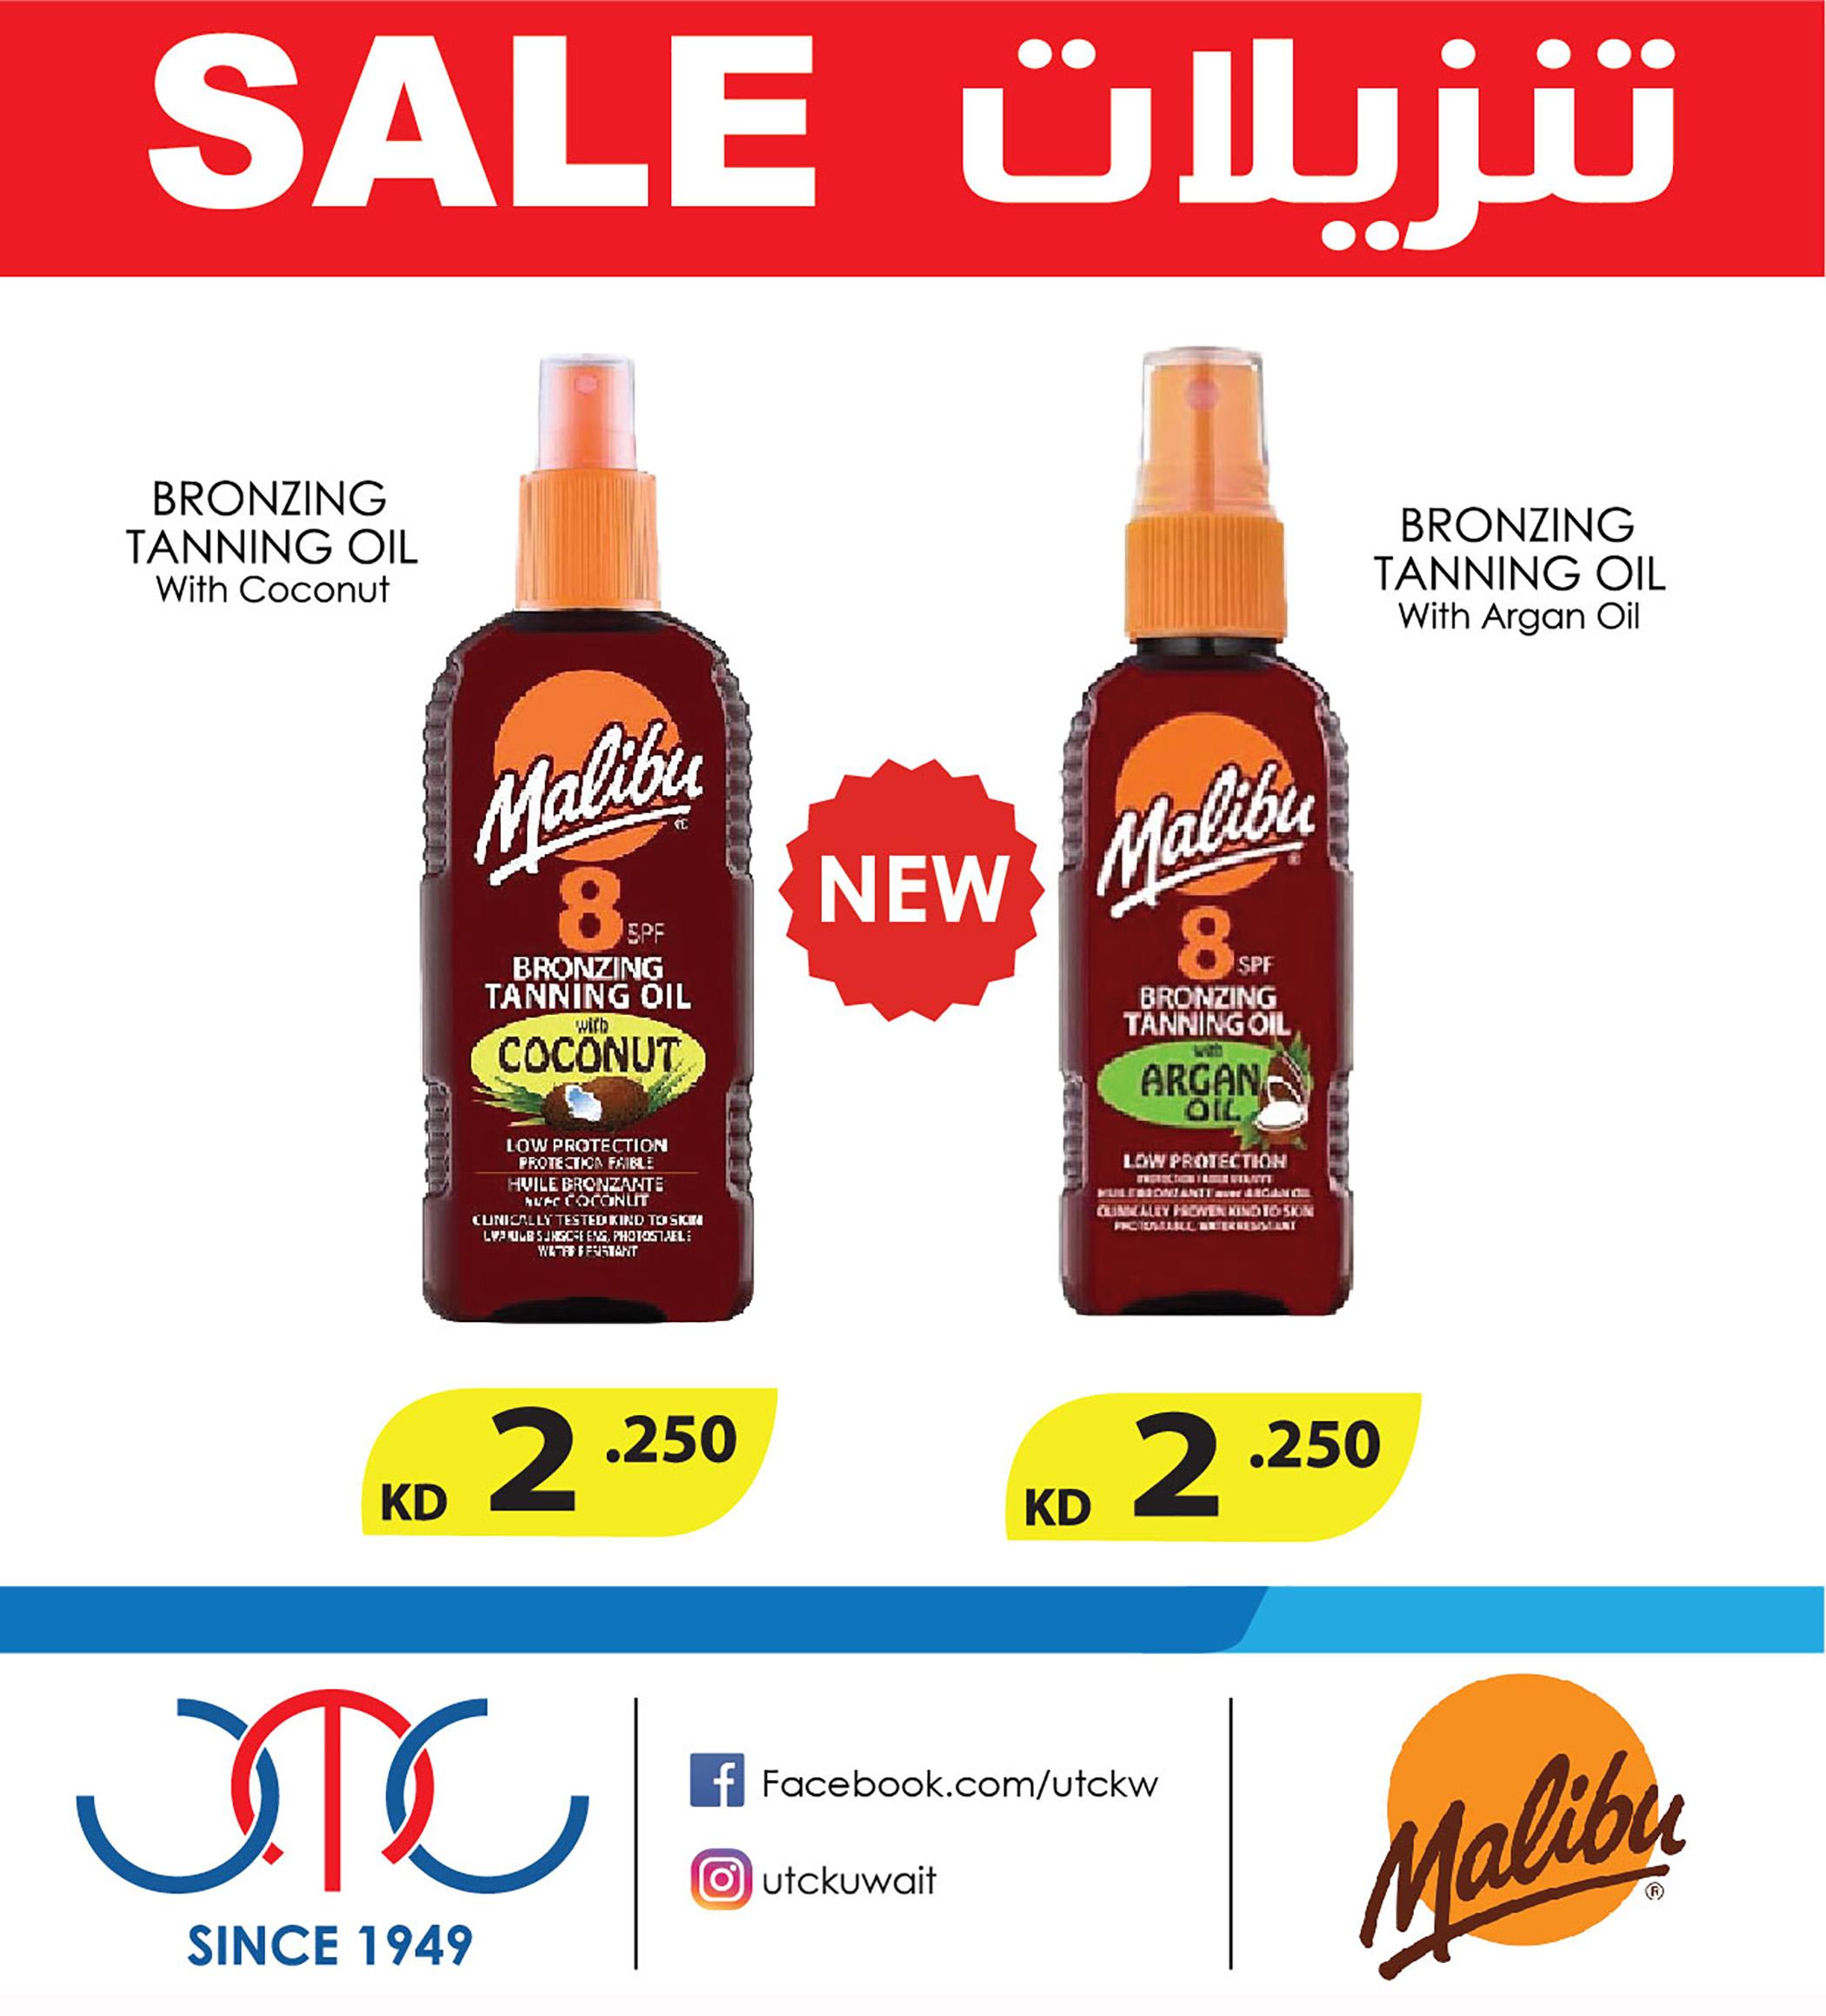 Flylite - Malibu Oil